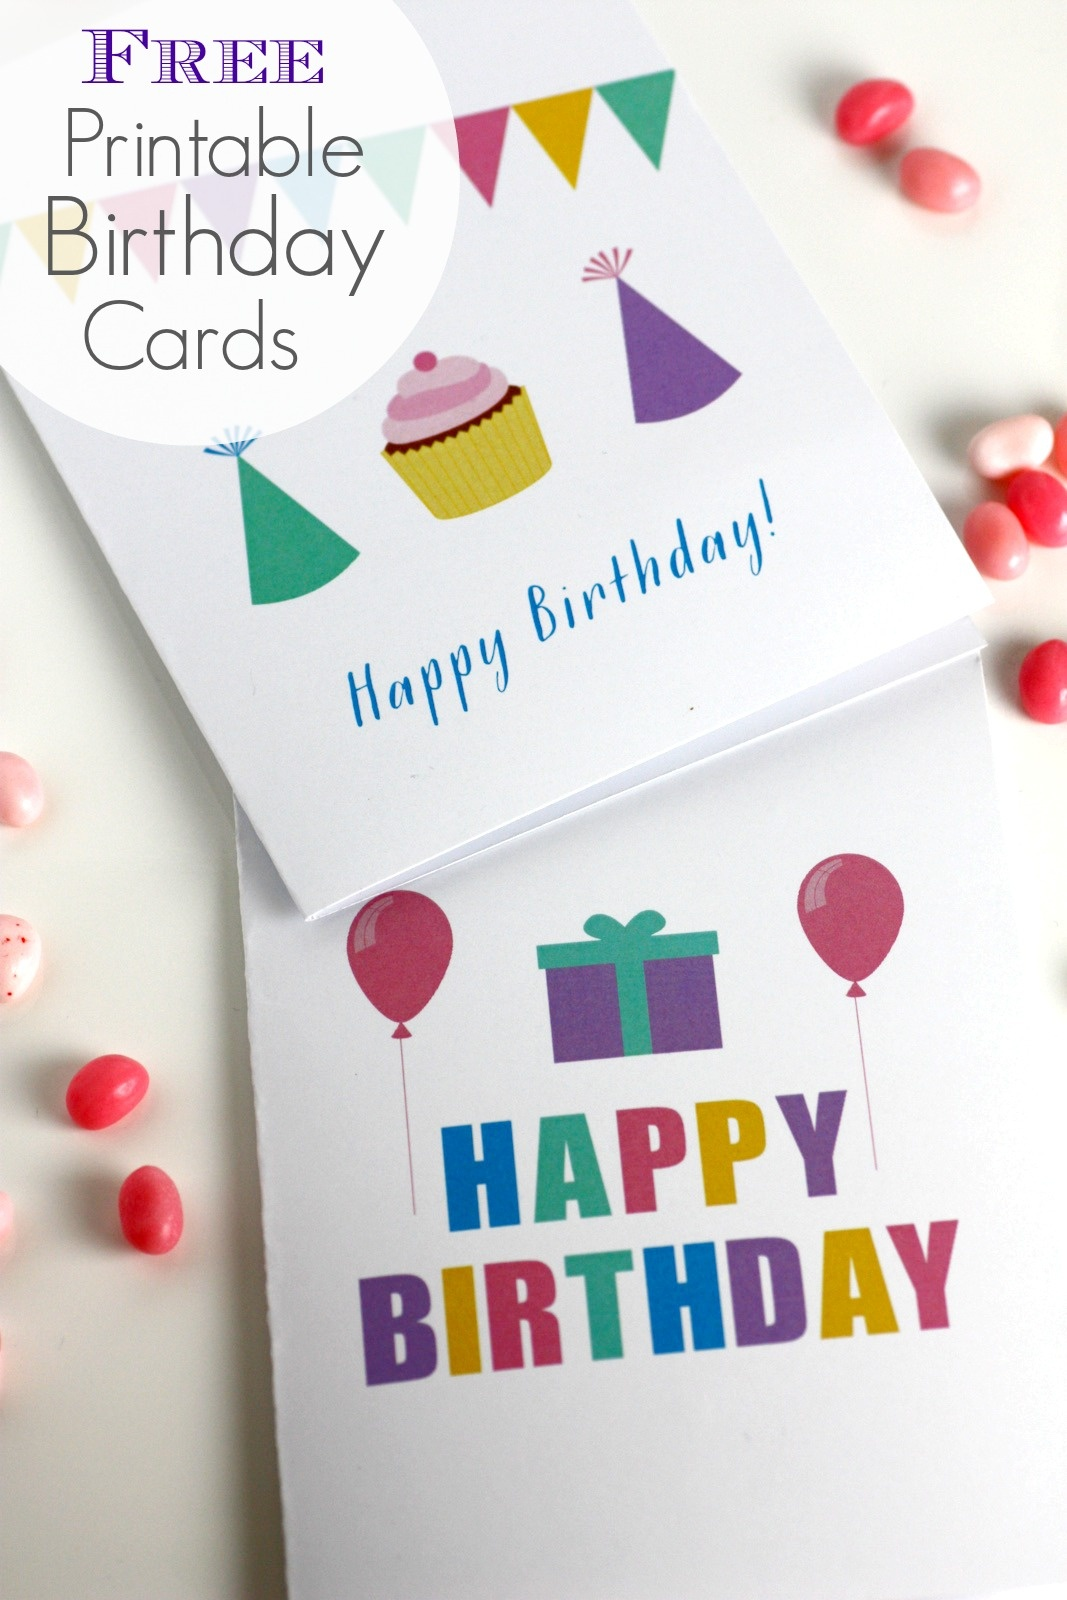 Free Printable Blank Birthday Cards   Catch My Party - Free Printable Happy Birthday Cards